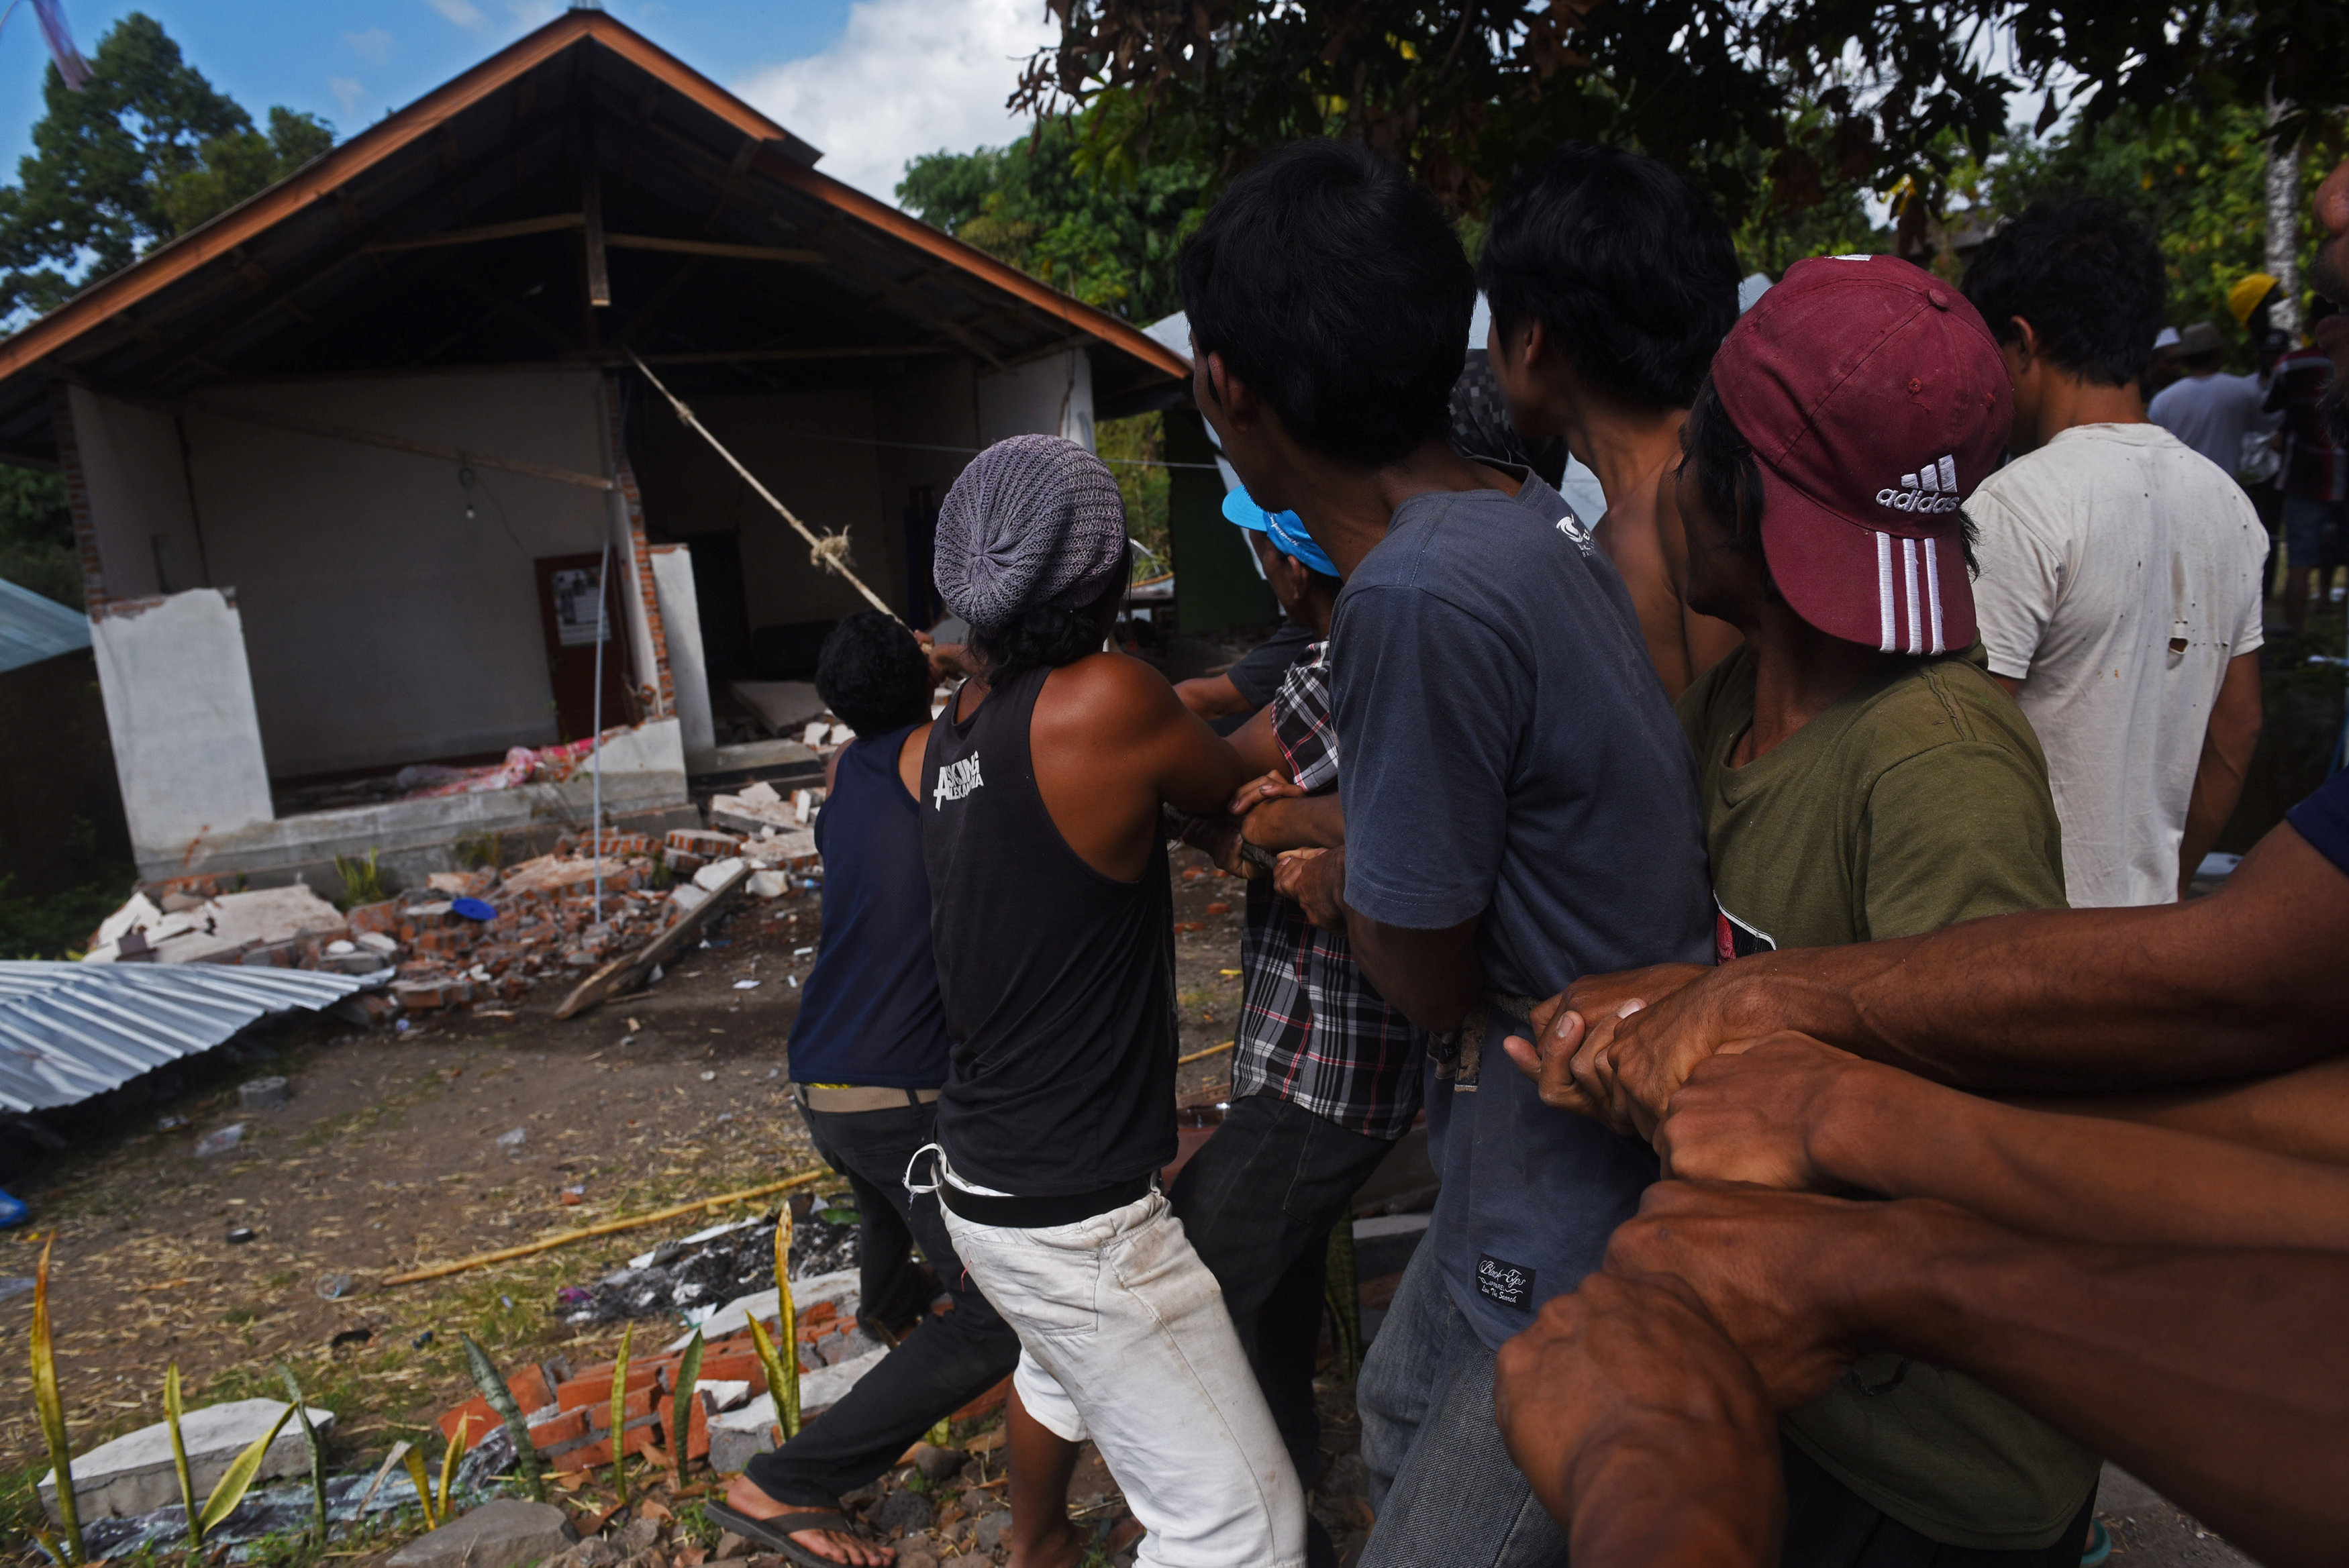 Residents pull down an earthquake damaged house in Kayangan, North Lombok, Indonesia August 12, 2018 in this photo taken by Antara Foto. Picture taken August 12, 2018. Antara Foto/Zabur Karuru/ via REUTERS